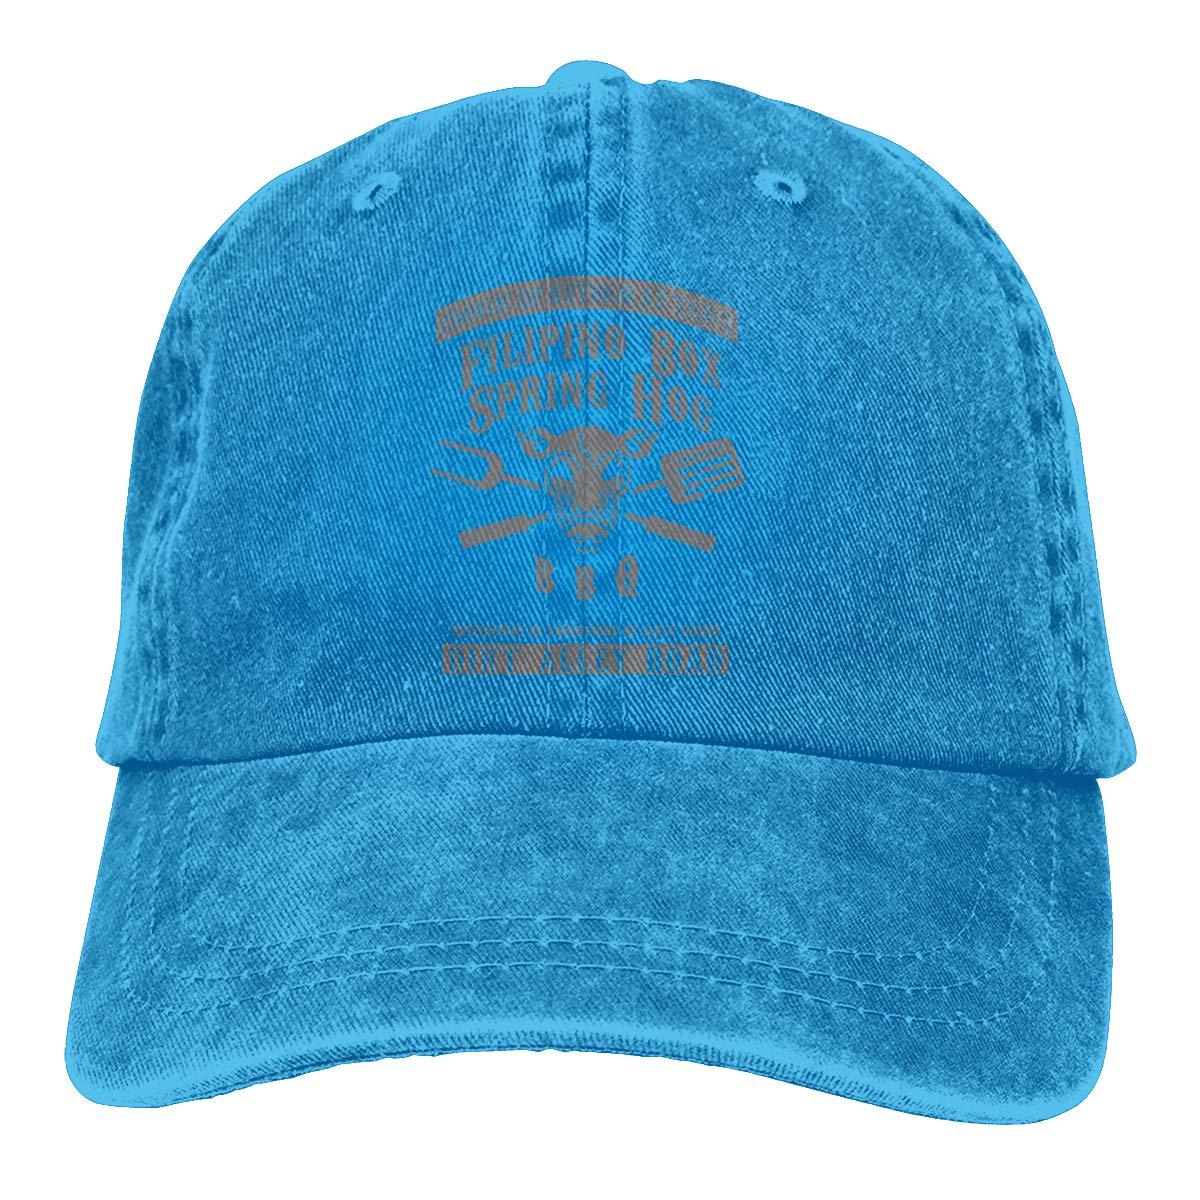 Tom Waits Inspired Filipino Box Spring Hog Adjustable Baseball Hat for Mens Caps